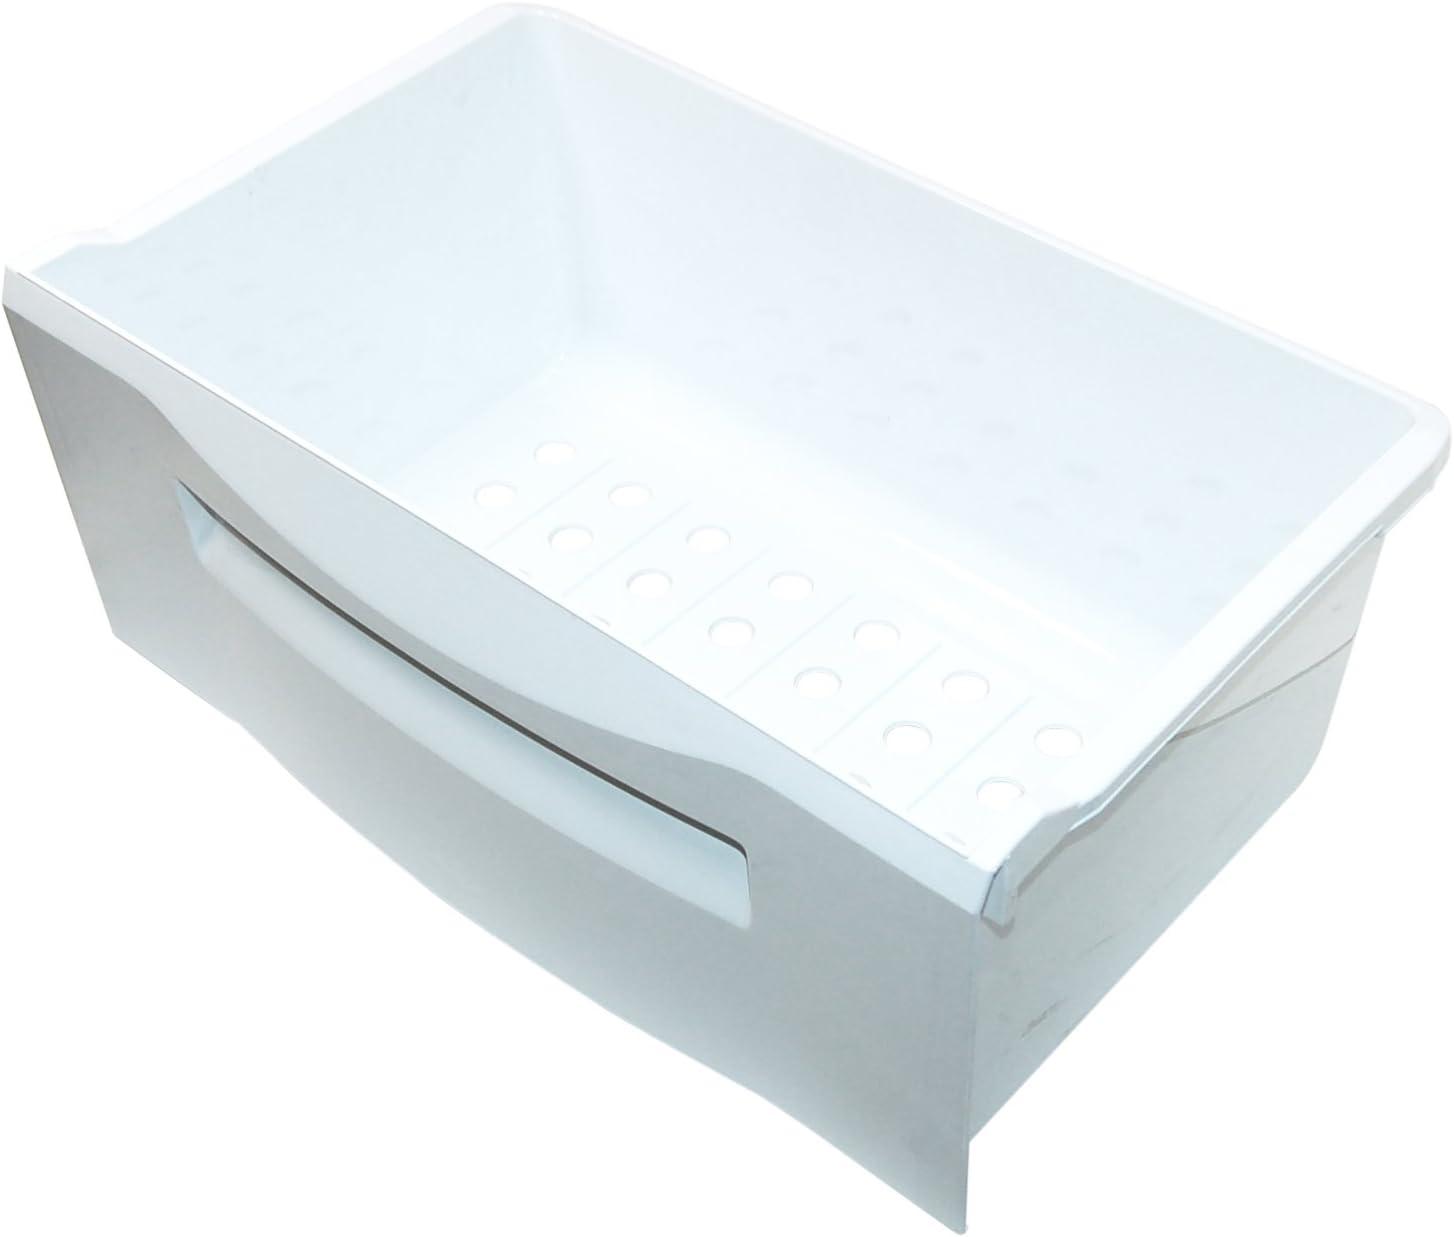 Daewoo frigorífico congelador blanco cajón frigorífico congelador ...